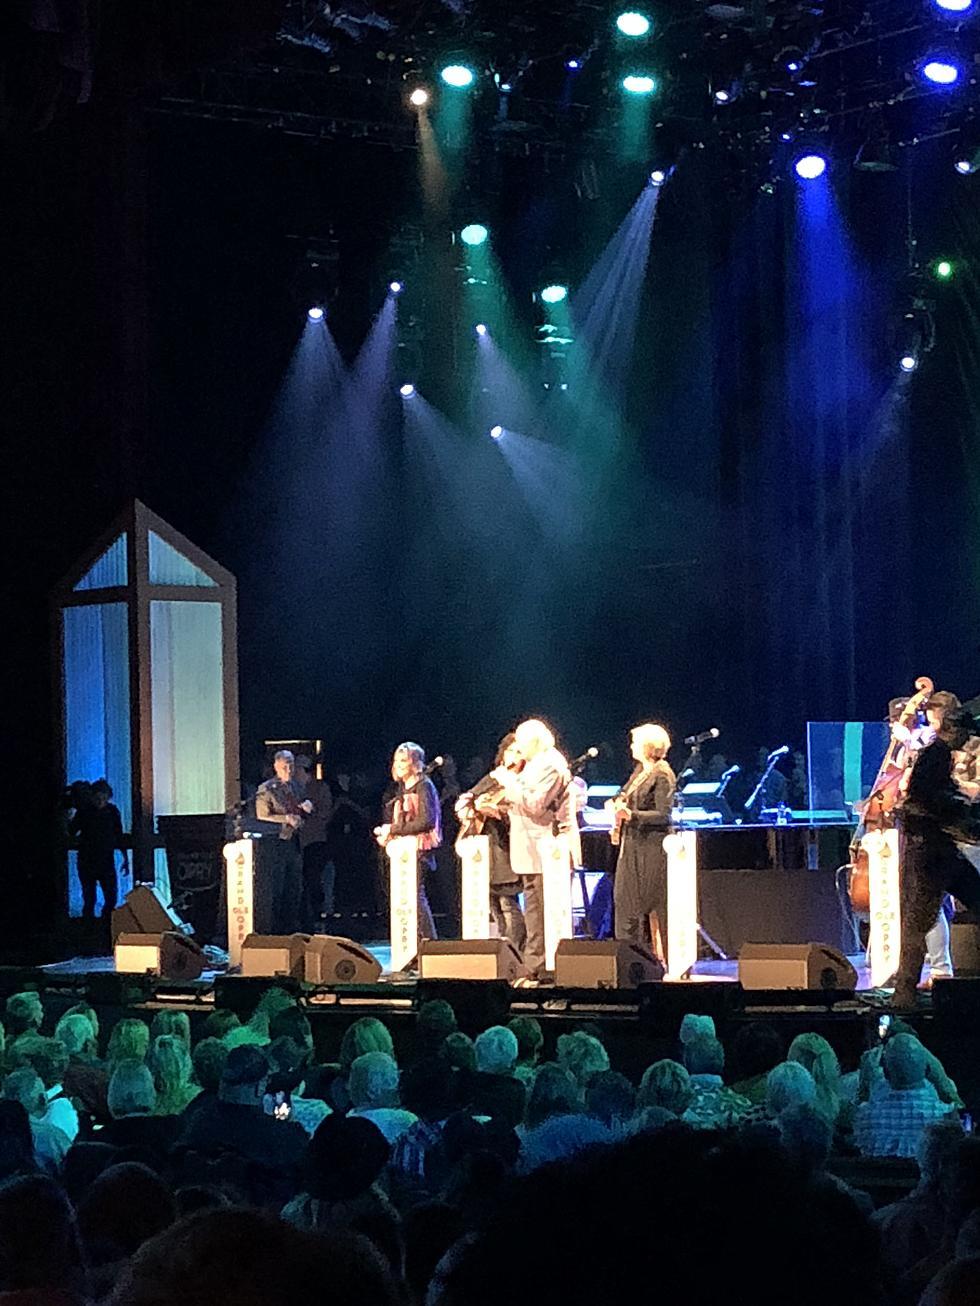 AM Minnesota: Minnesota Gospel Opry Welcomes The Isaacs